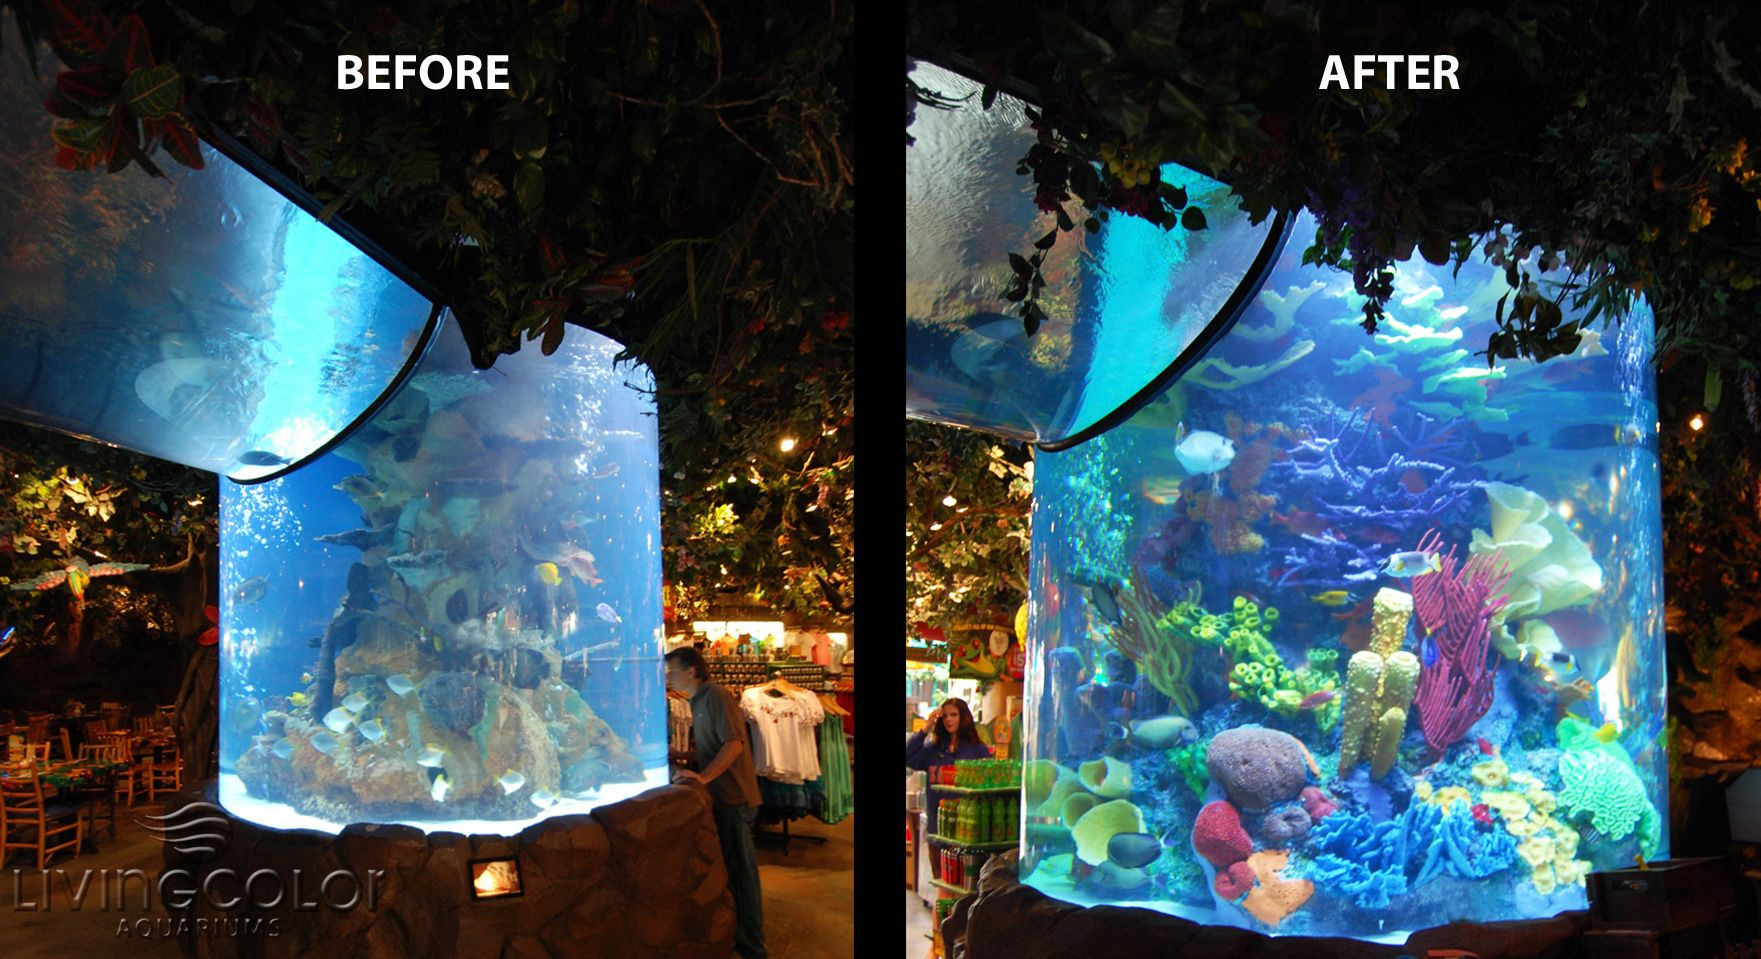 Living color aquarium fish tank kings - Artificial Coral Artificial Reef Living Color Corals And Reefs Rainforest Cafe Volume Gallons Total Aquariums